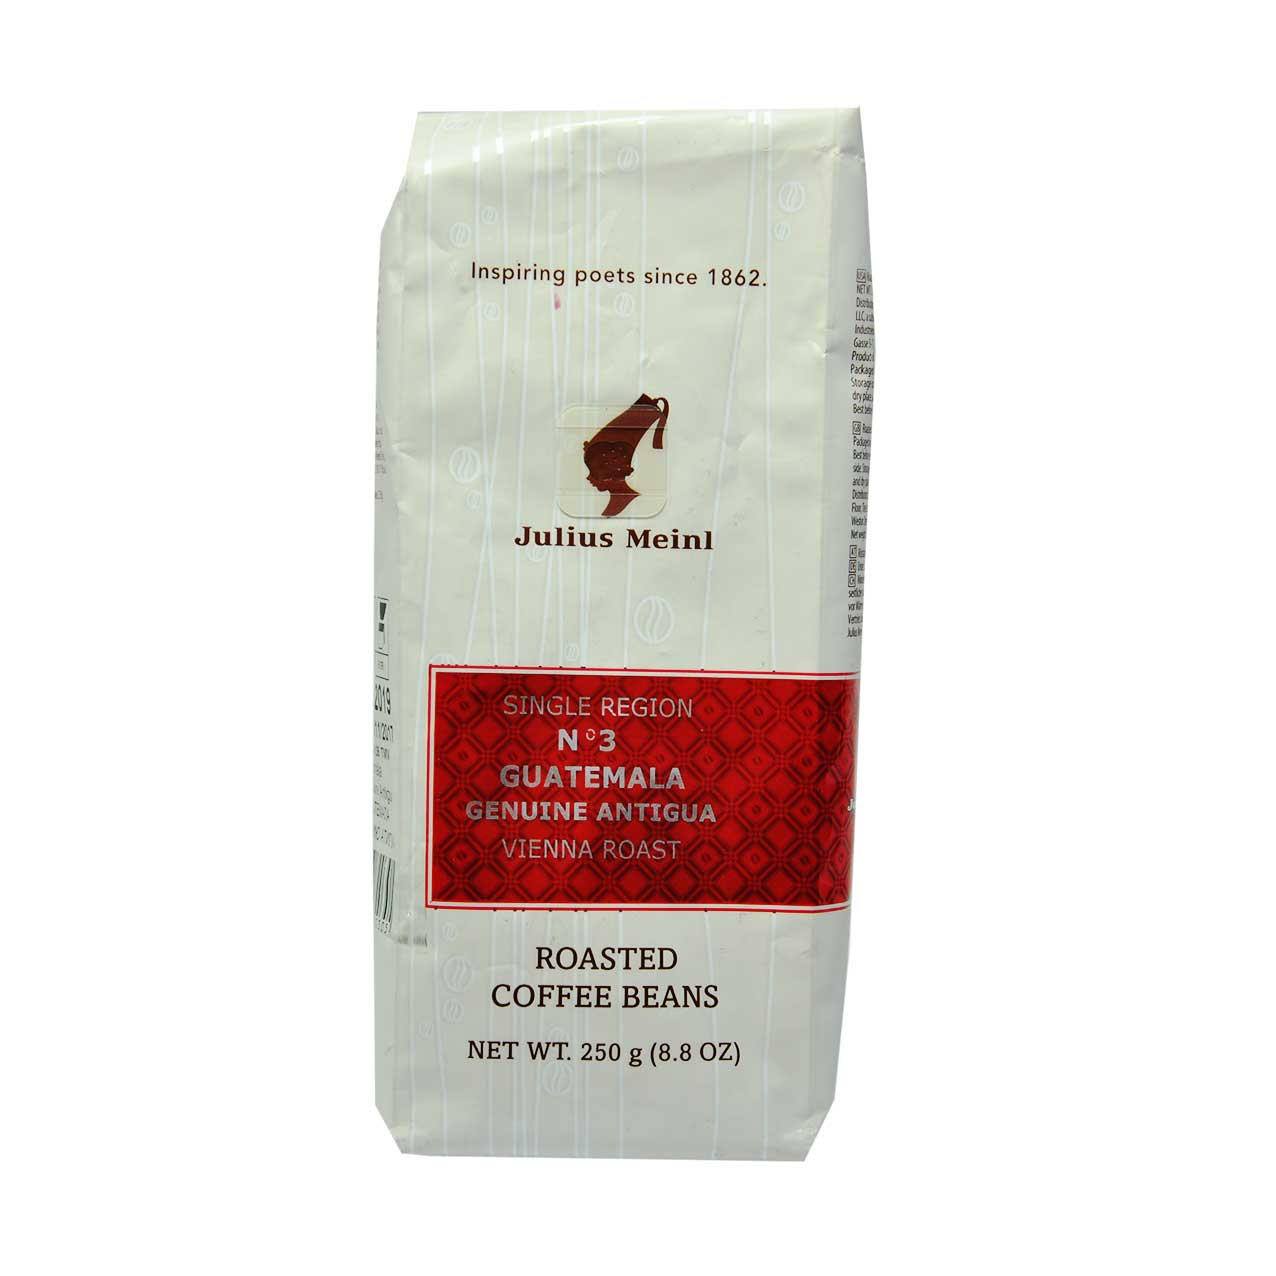 قهوه دان گواتمالا جولیوس ماینل – julius meinl